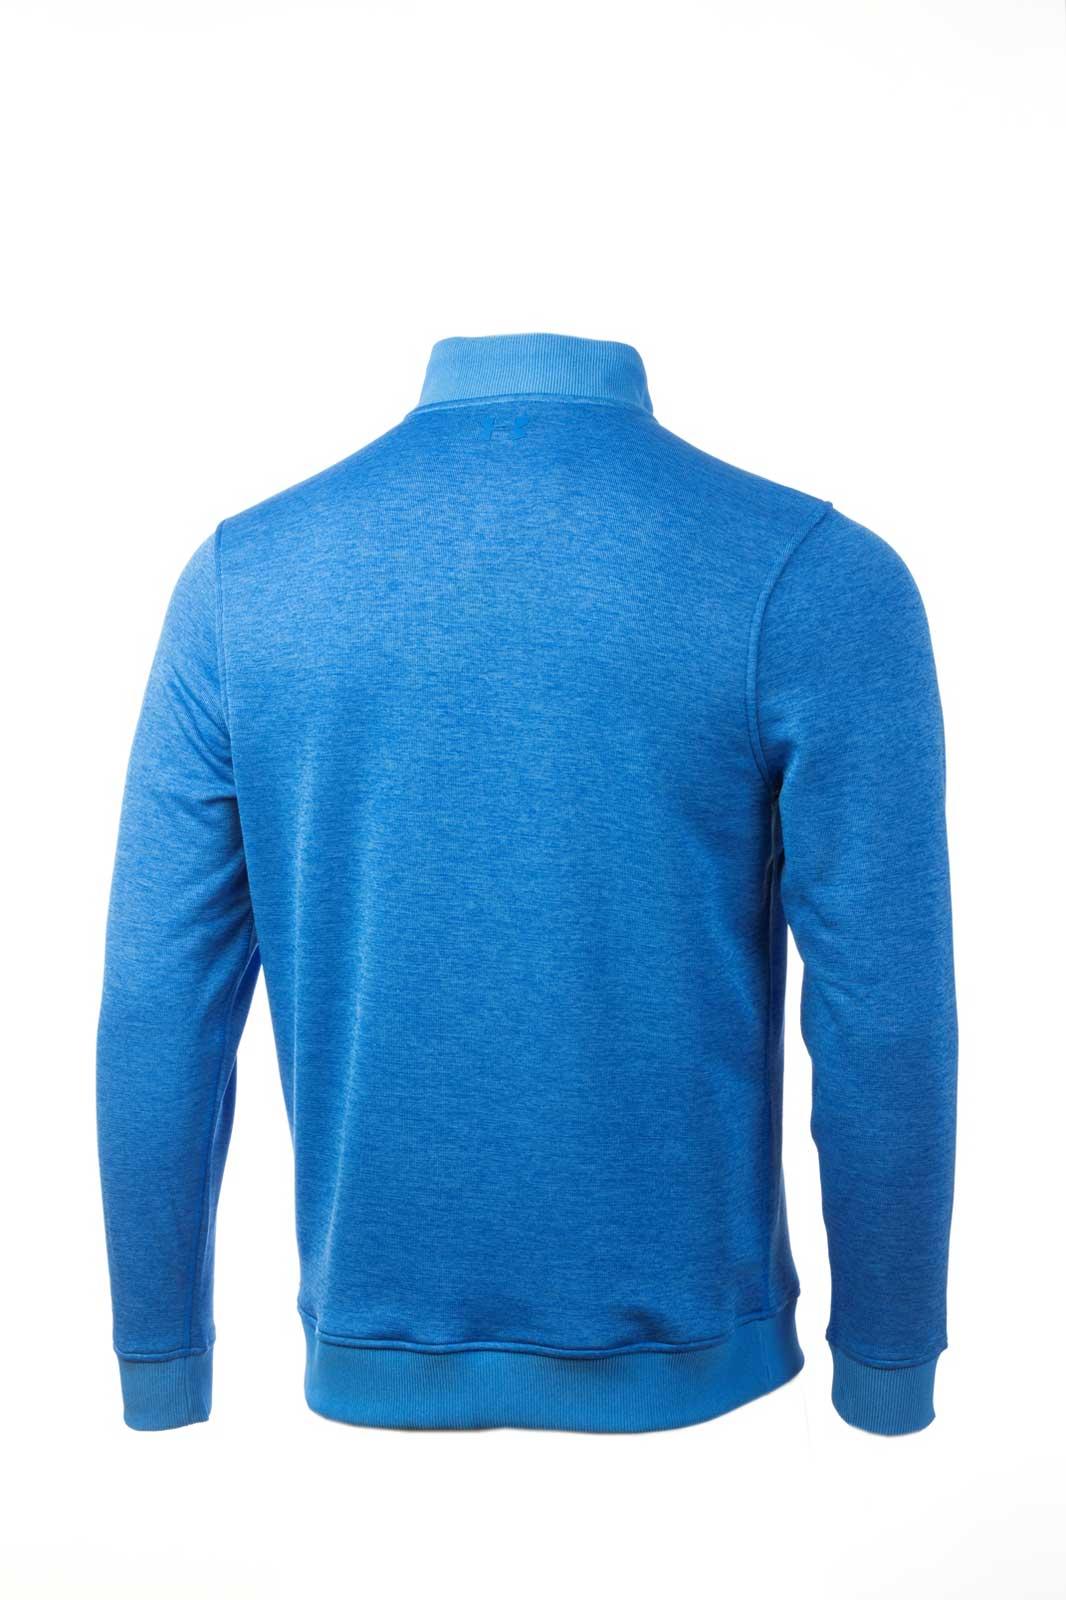 Under Armour Zip Storm Fleece Sweater Royal Dornoch Pro Shop